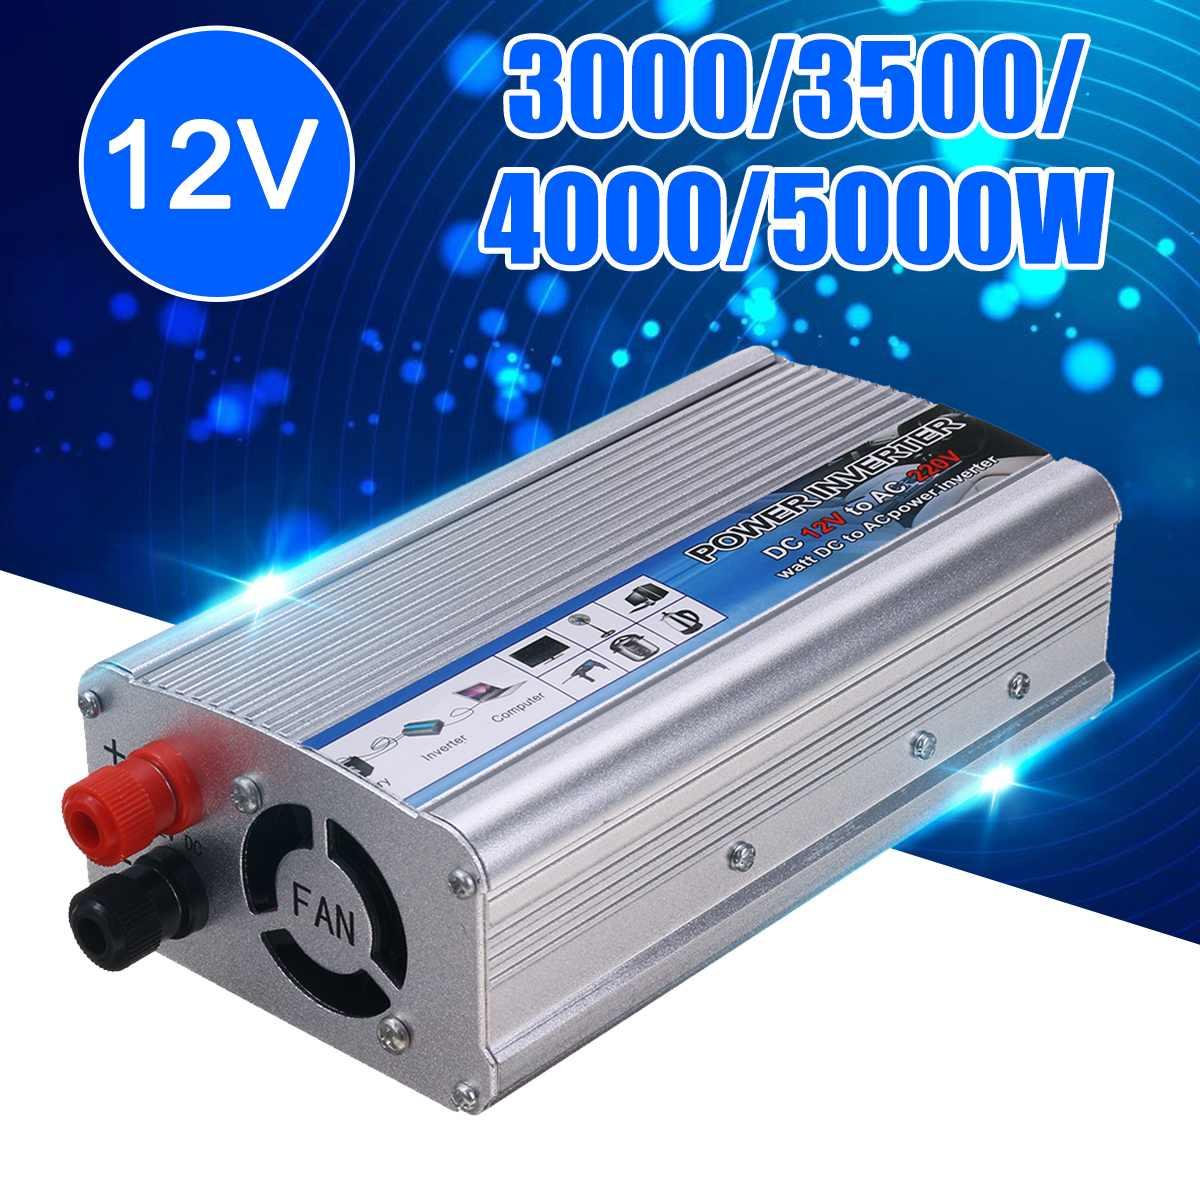 Hot 5000W-3000 Watt Solar Power Inverter DC 12V To AC 220V USB Modified Sine Wave Converter Car Power Inverter Charger Adapter